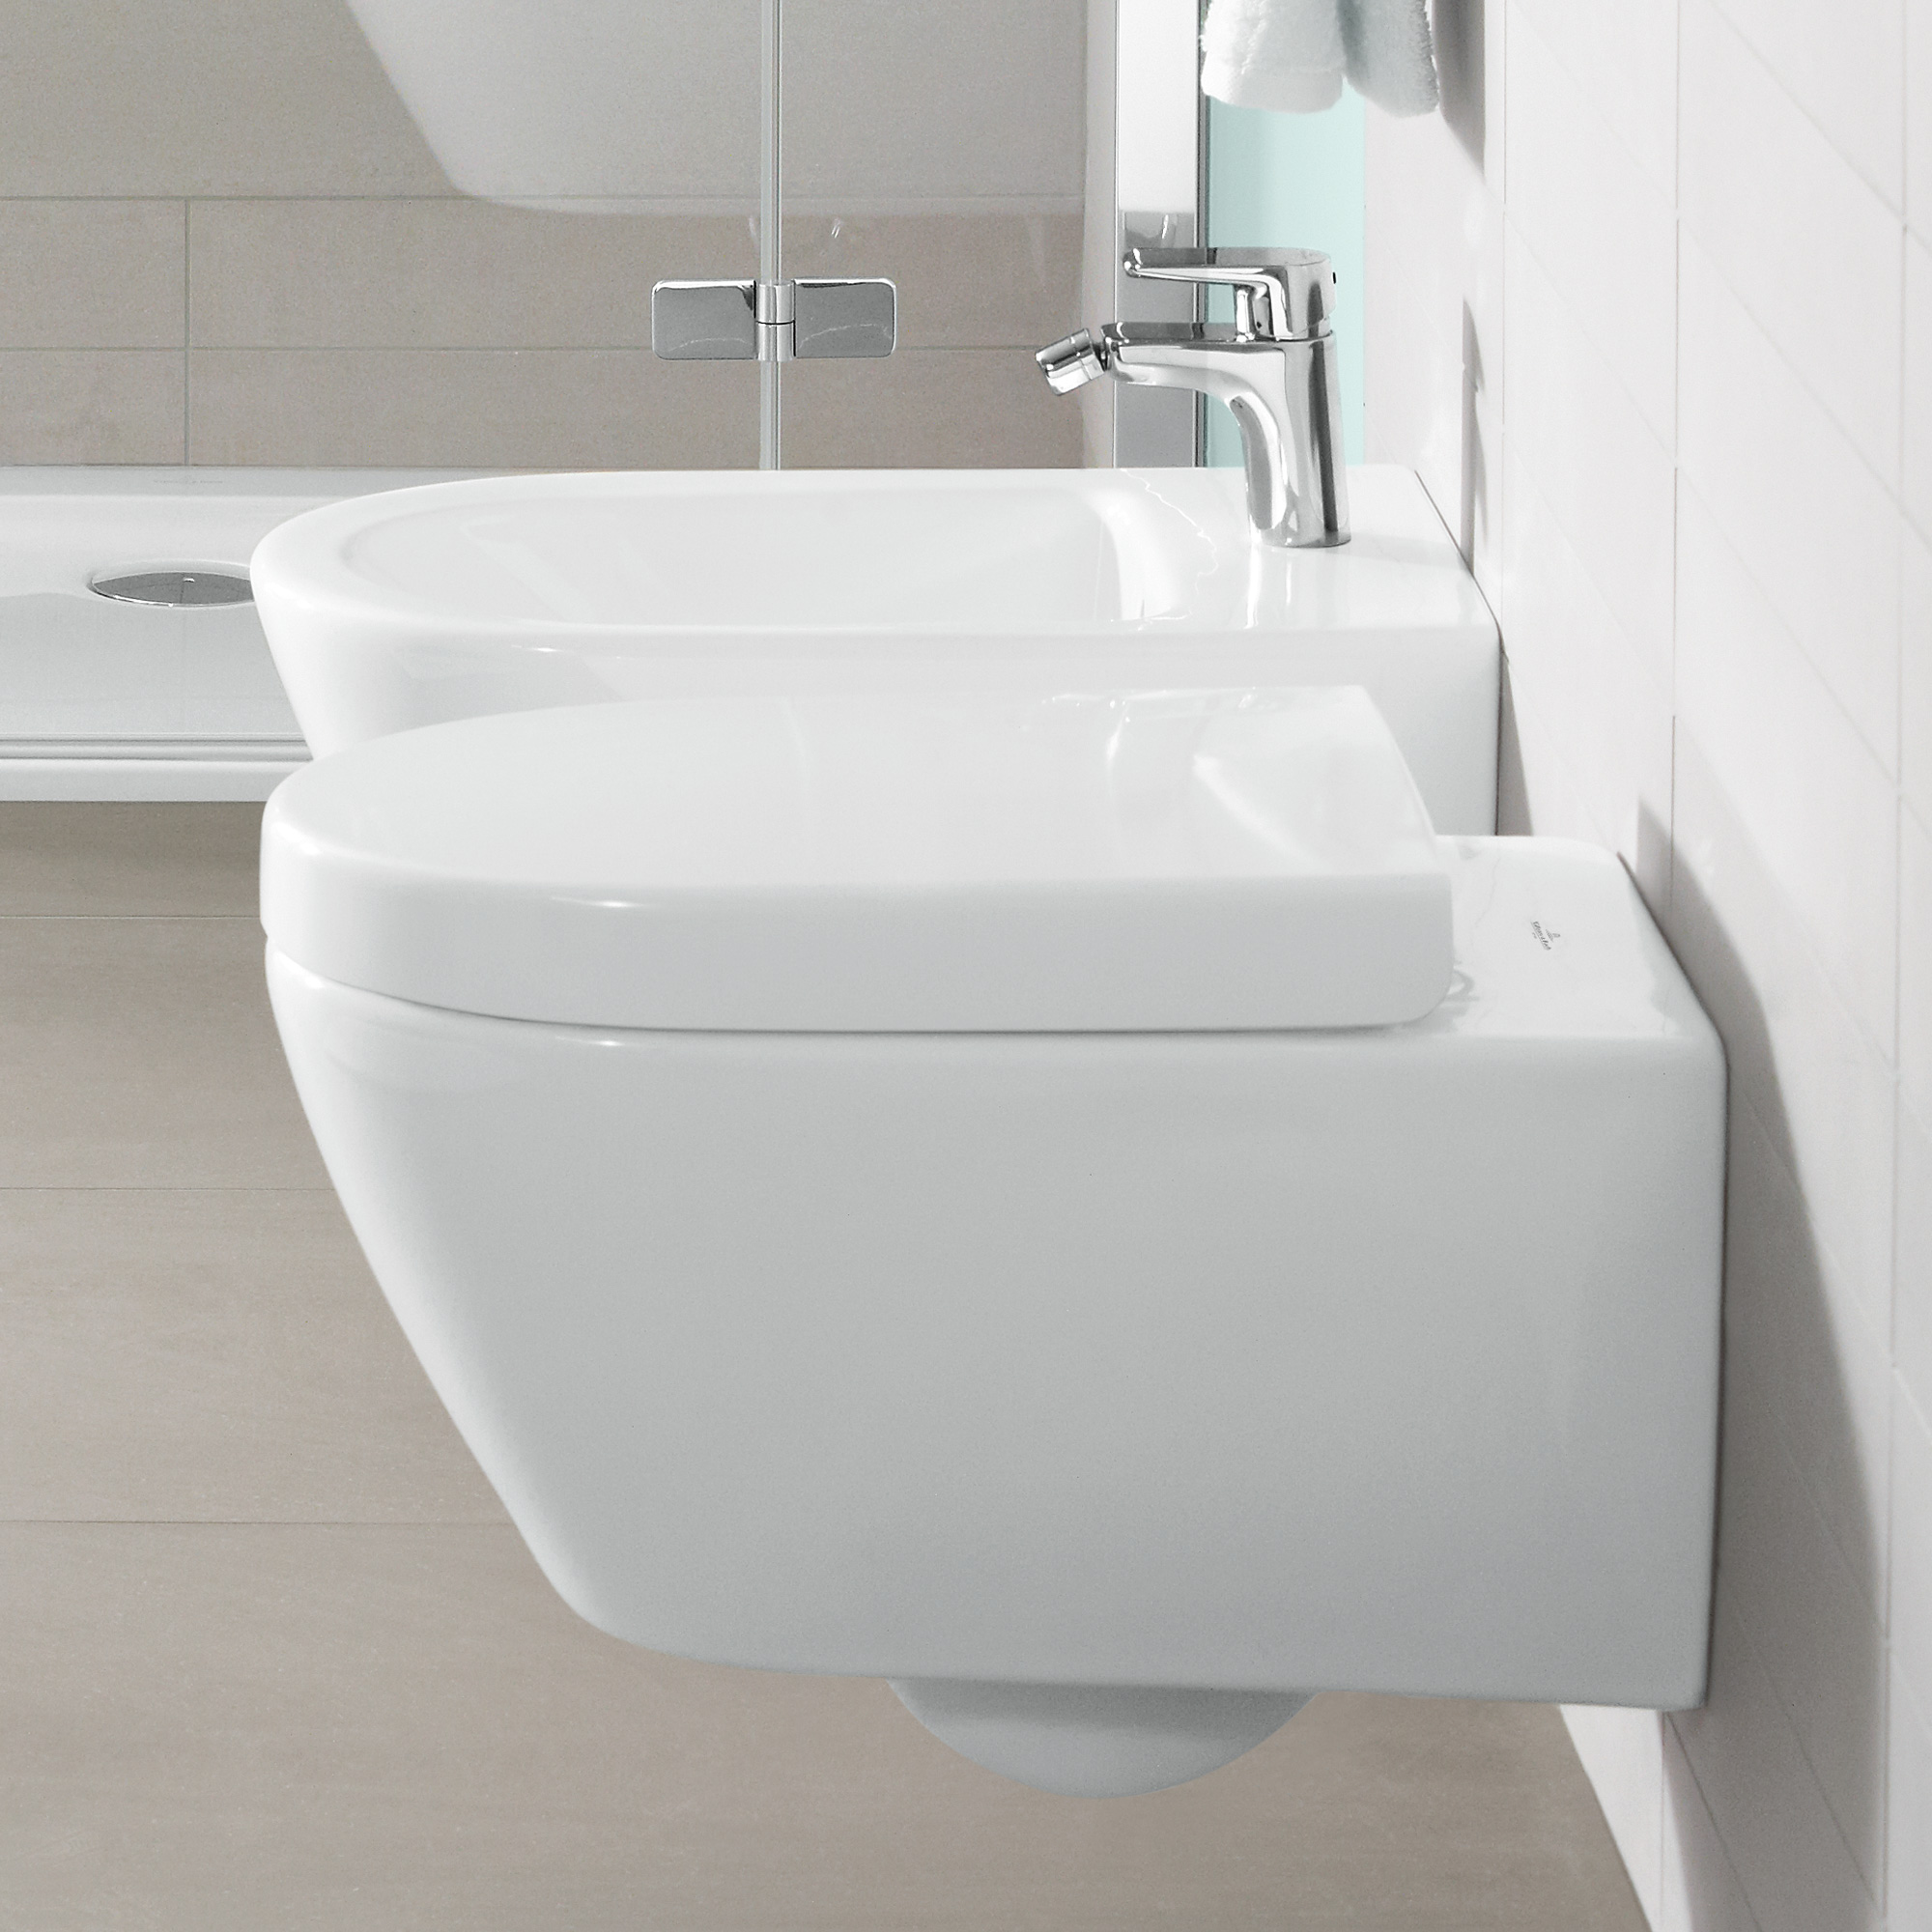 villeroy boch subway 2 0 tiefsp l wand wc l 56 b 37 cm wei 56001001 reuter onlineshop. Black Bedroom Furniture Sets. Home Design Ideas